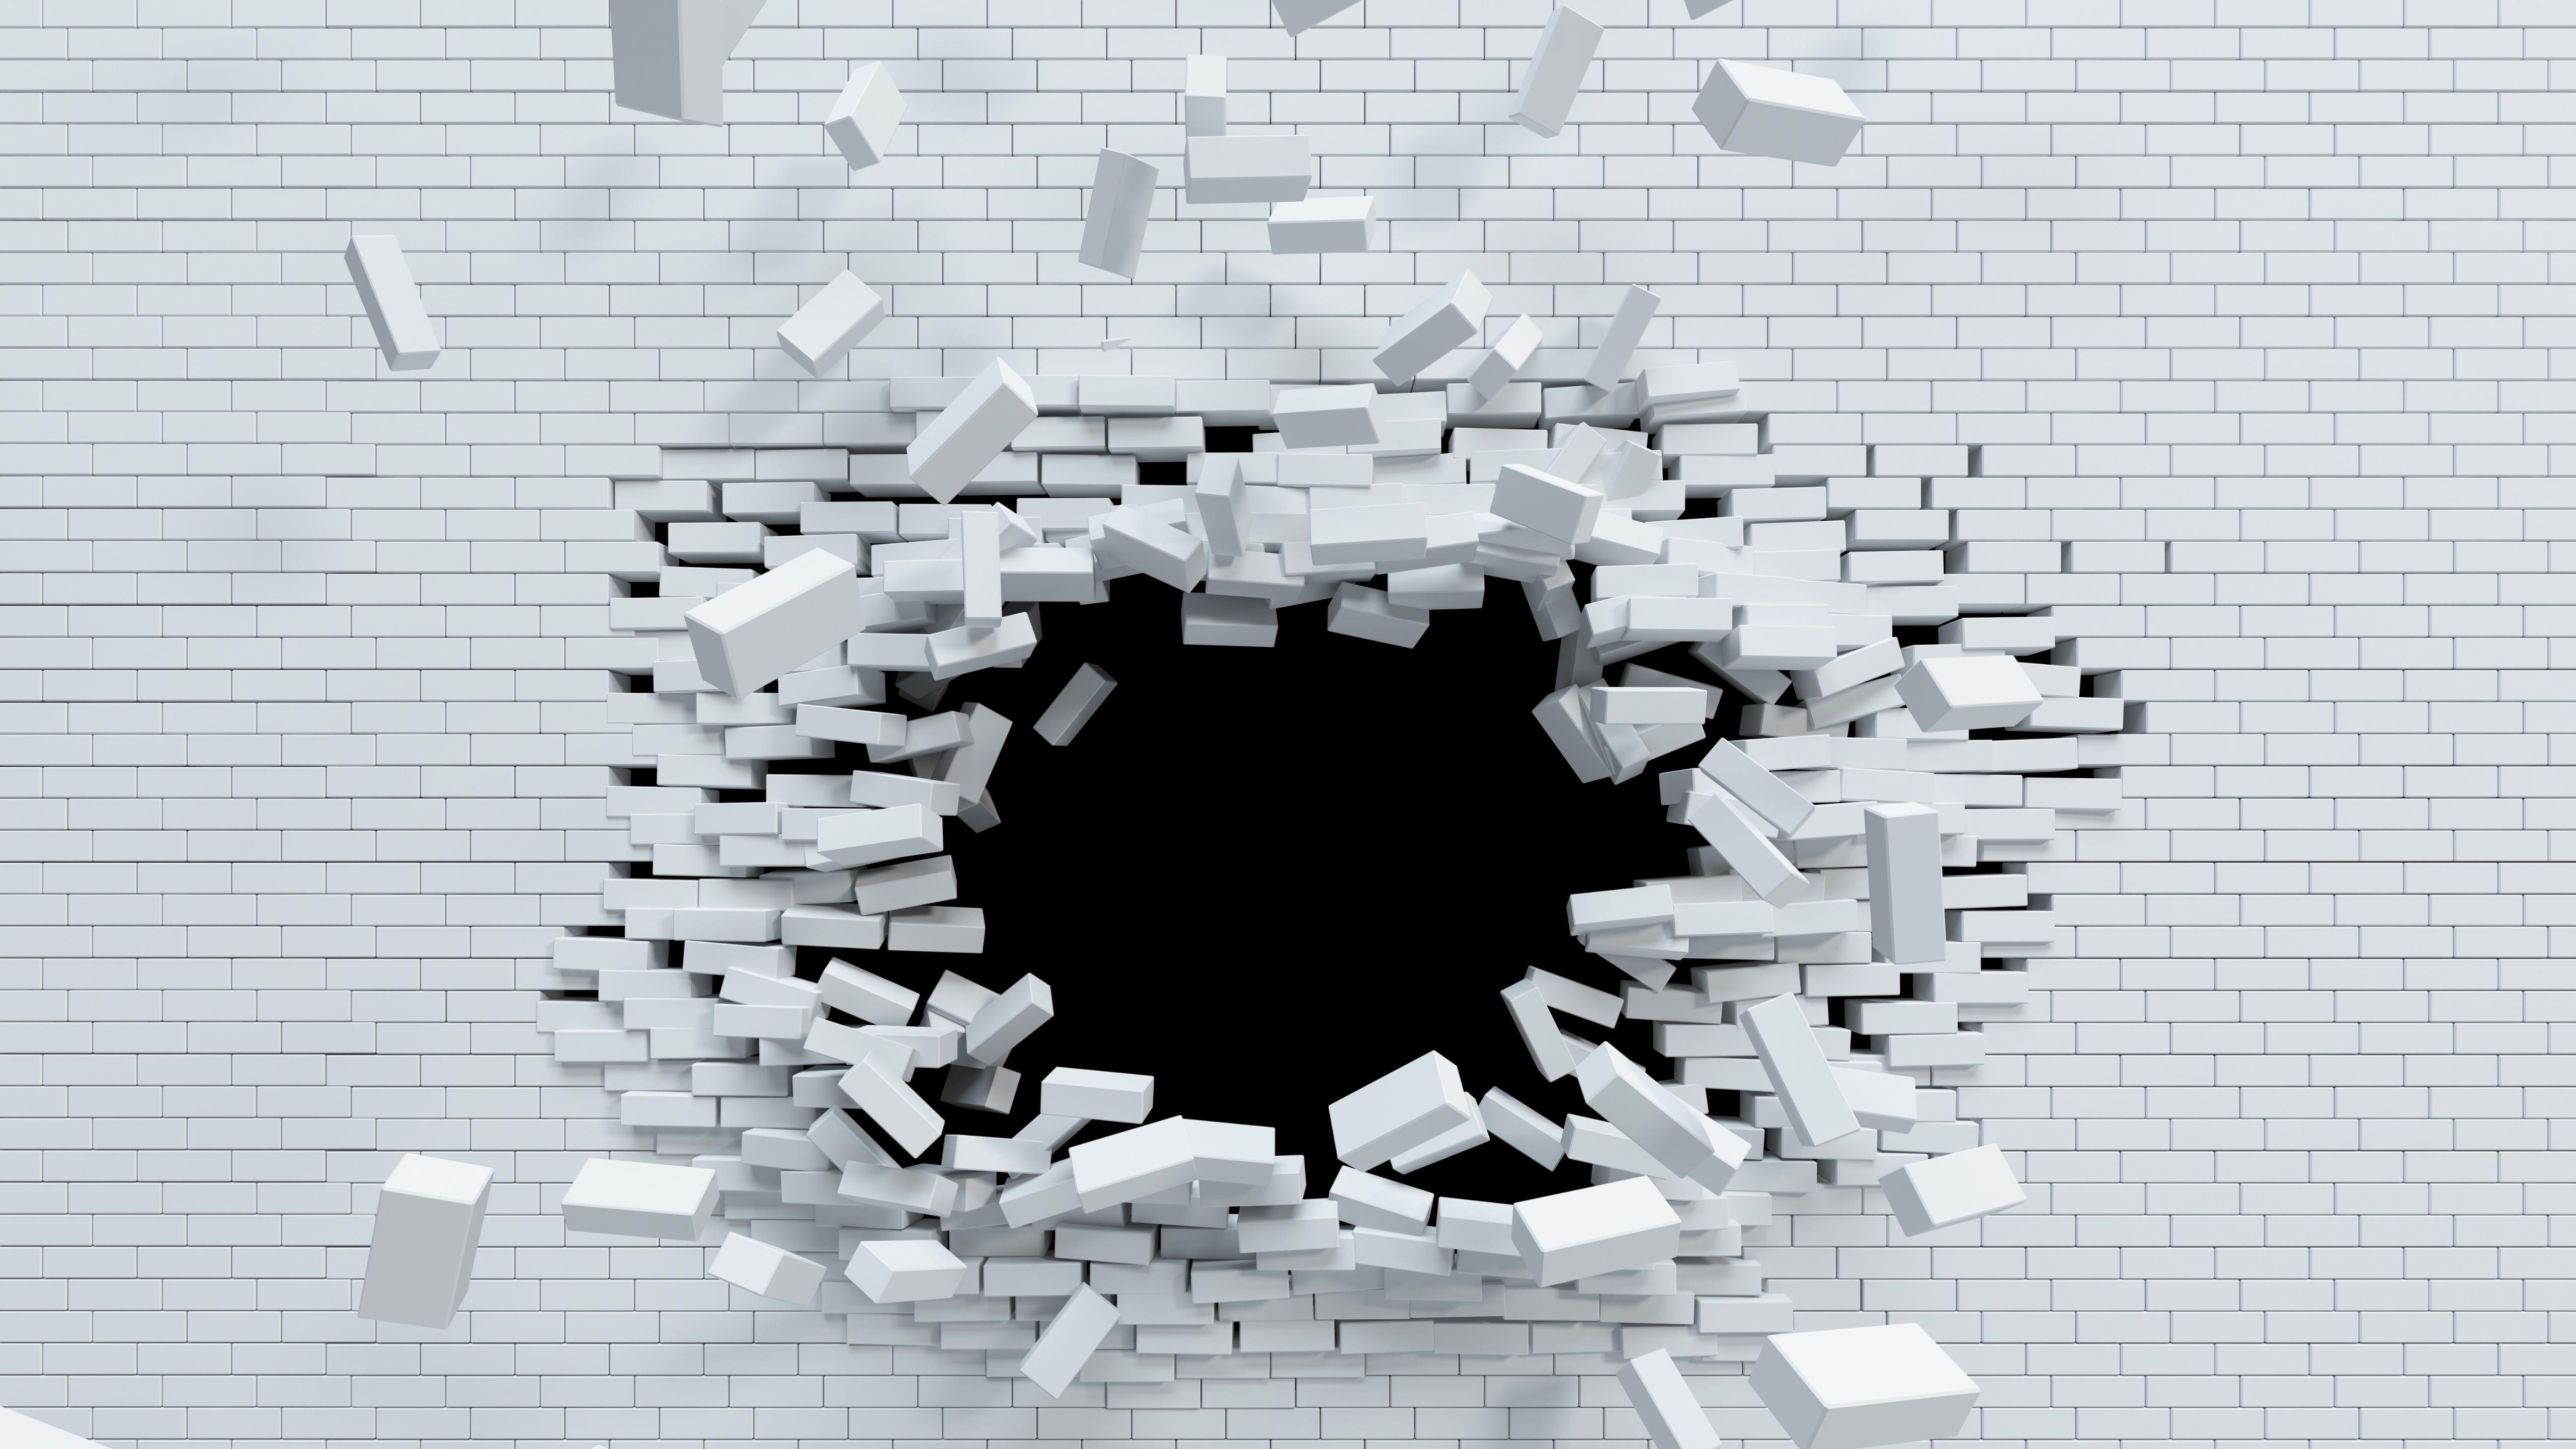 Black And White Font Monochrome Wall Brick 3d Digital Art Destroyed Destroy Brick Wall Hole 5k Wallpaper Hdwallpa Wallpaper Abstract Monochrome Wall